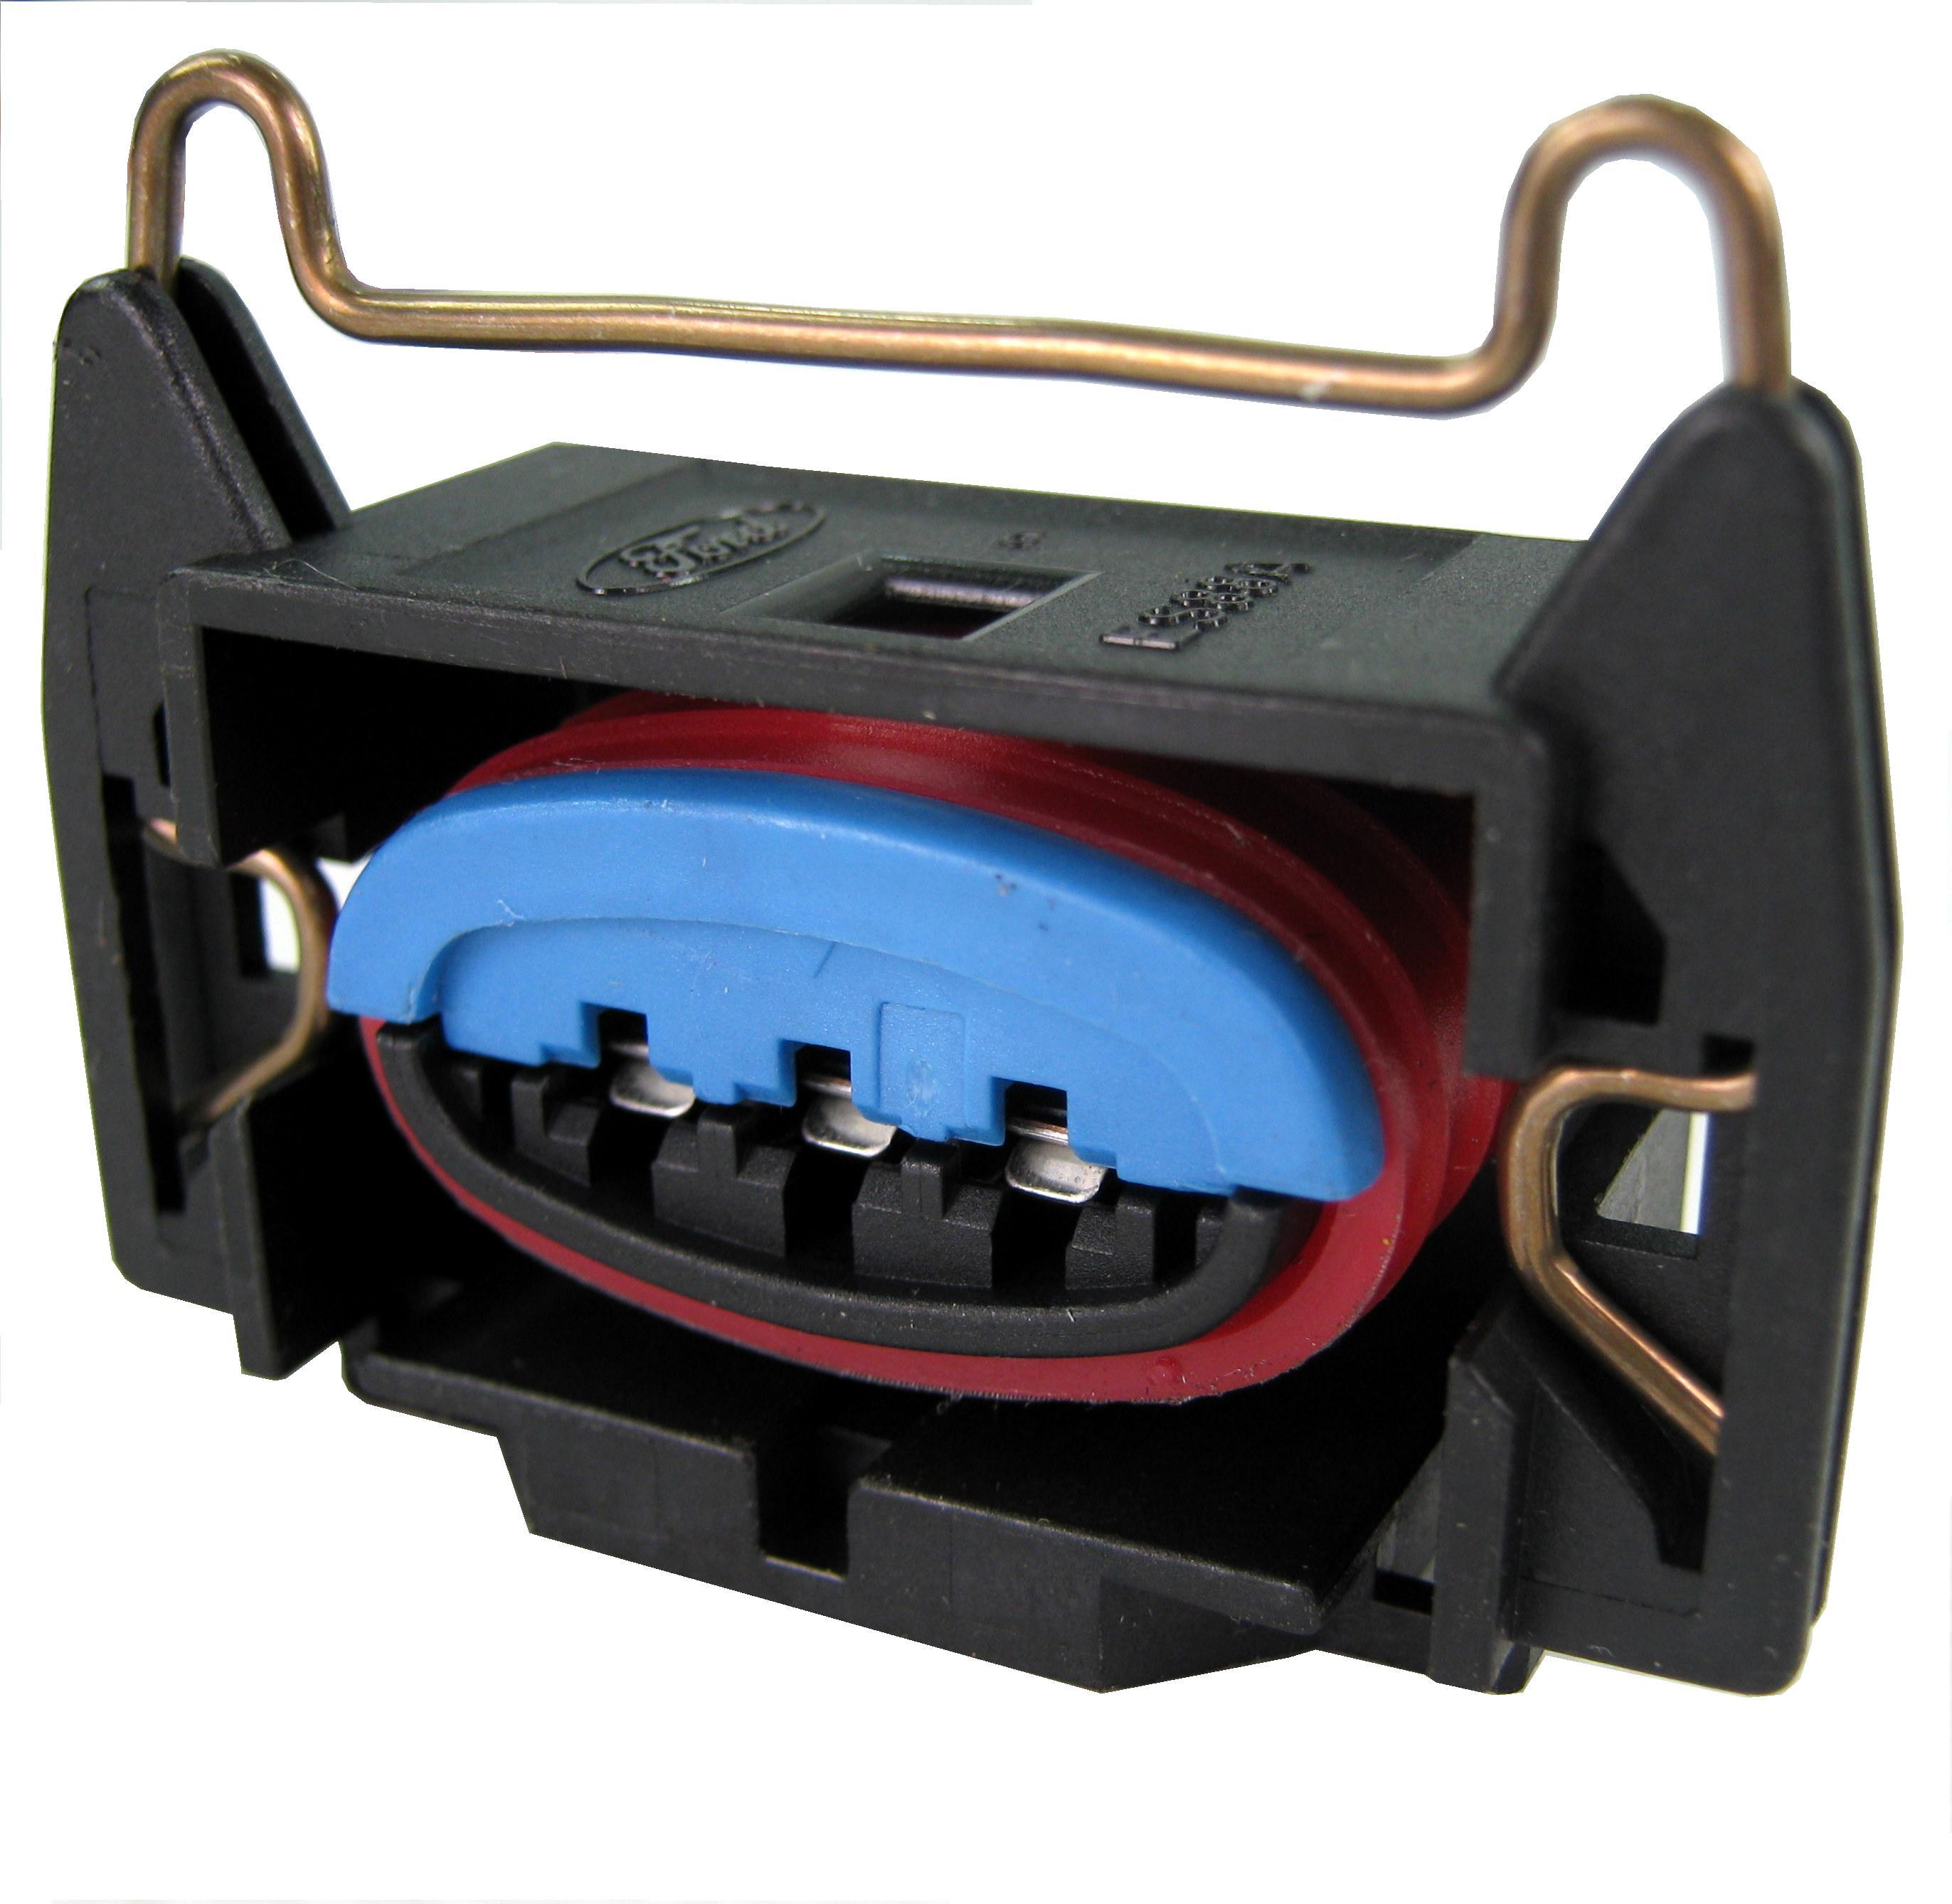 Details about Ford EDIS coil pack connector plug Megasquirt 4cyl ECU ka  sierra escort focus